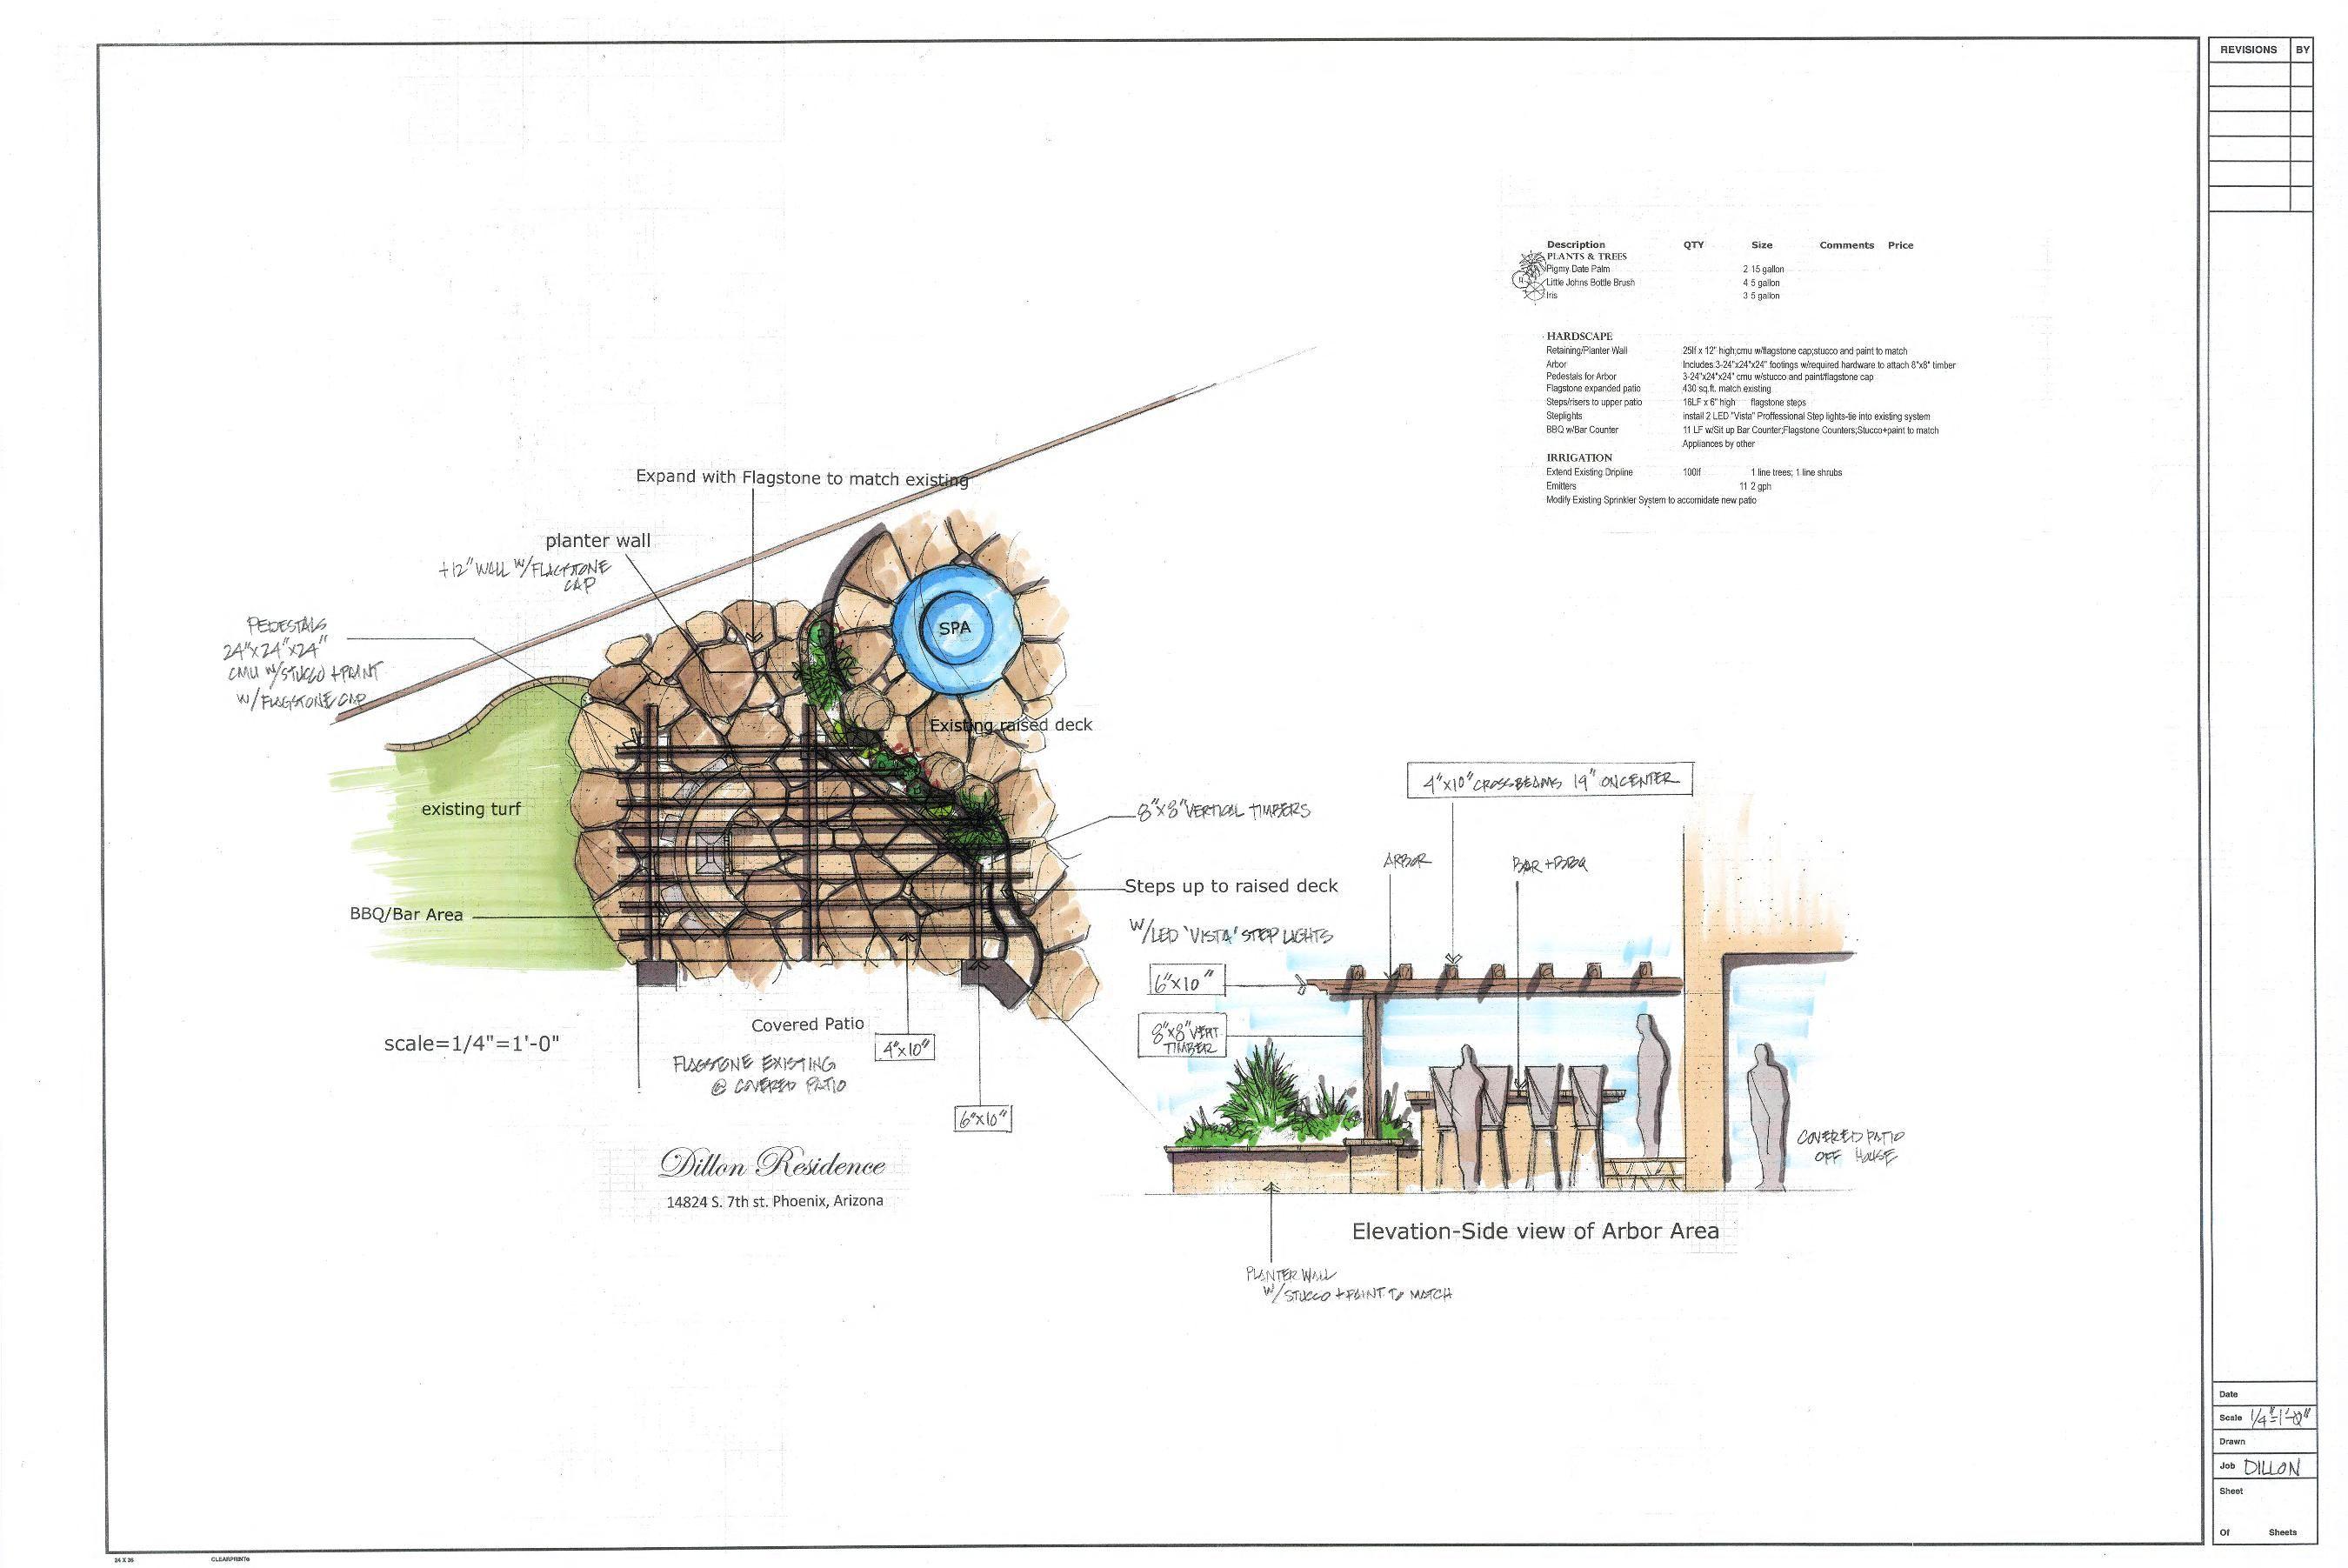 Design Dillon_001-page-001.jpg